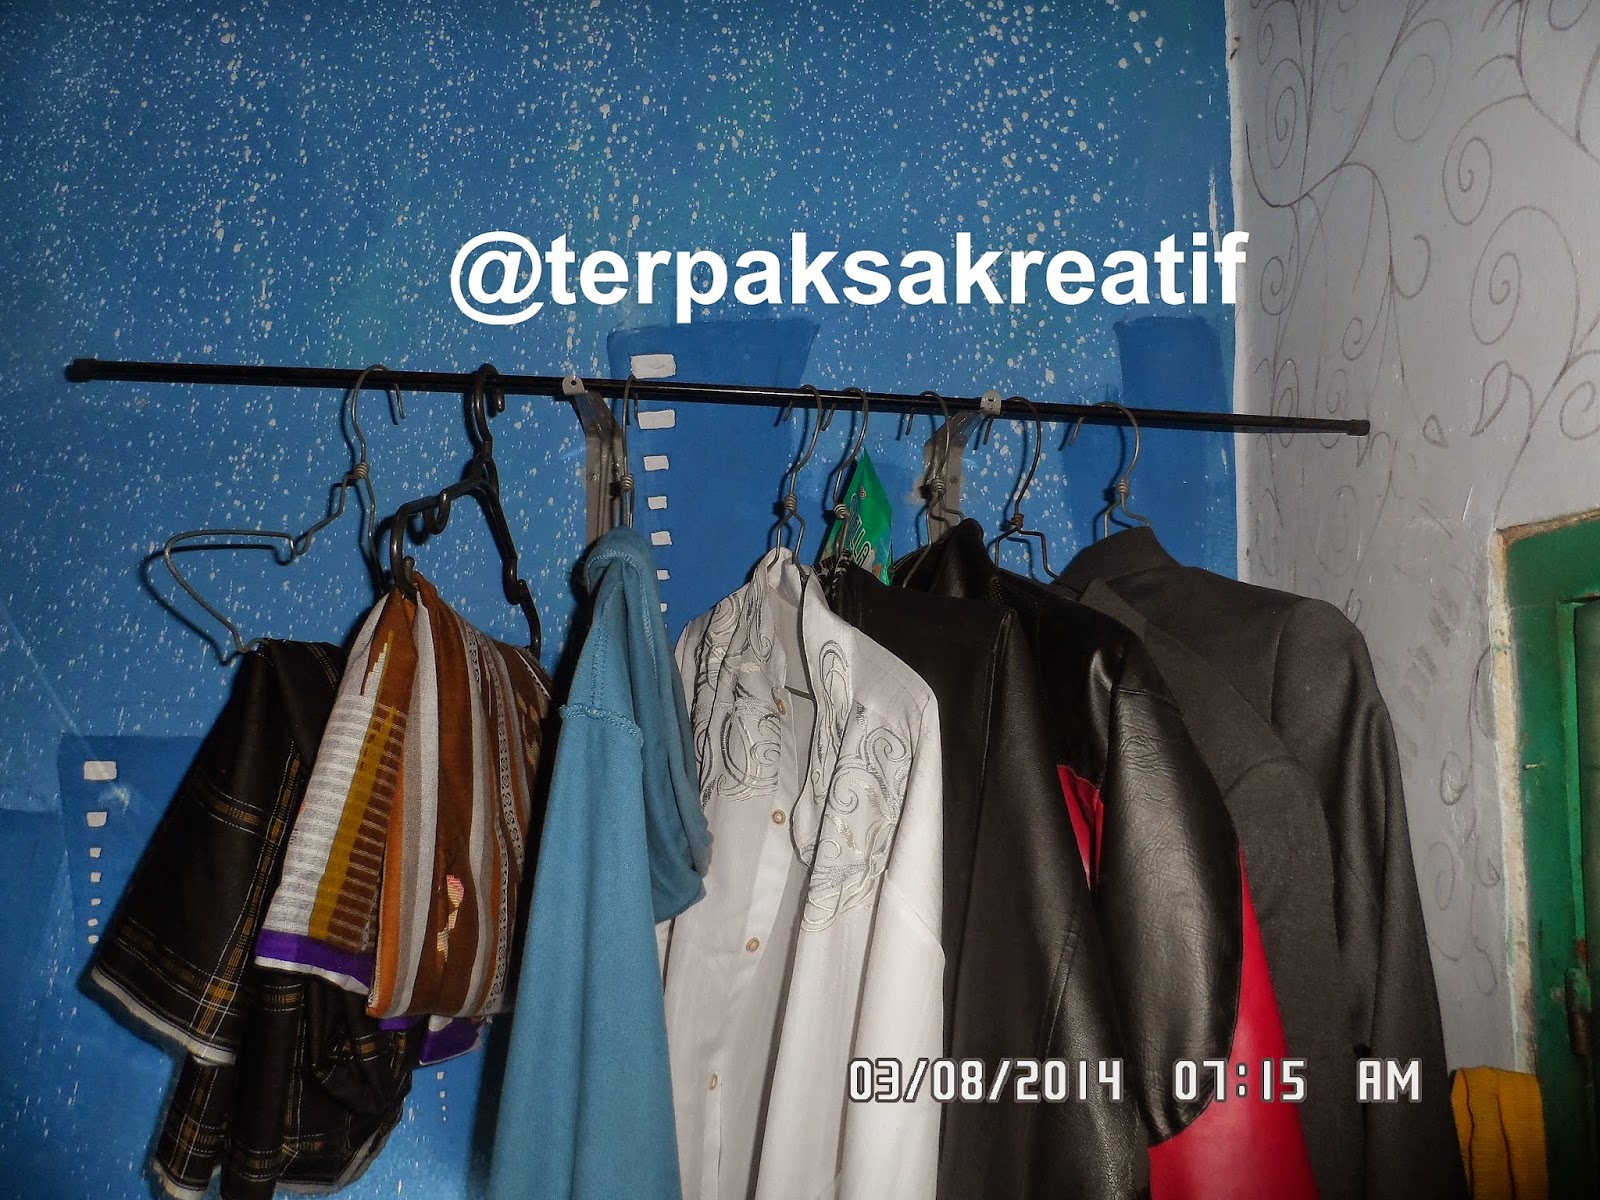 Cara Kreatif Membuat Gantungan Baju dari barang bekas disekitar kita | http://terpaksakreatif.blogspot.co.id